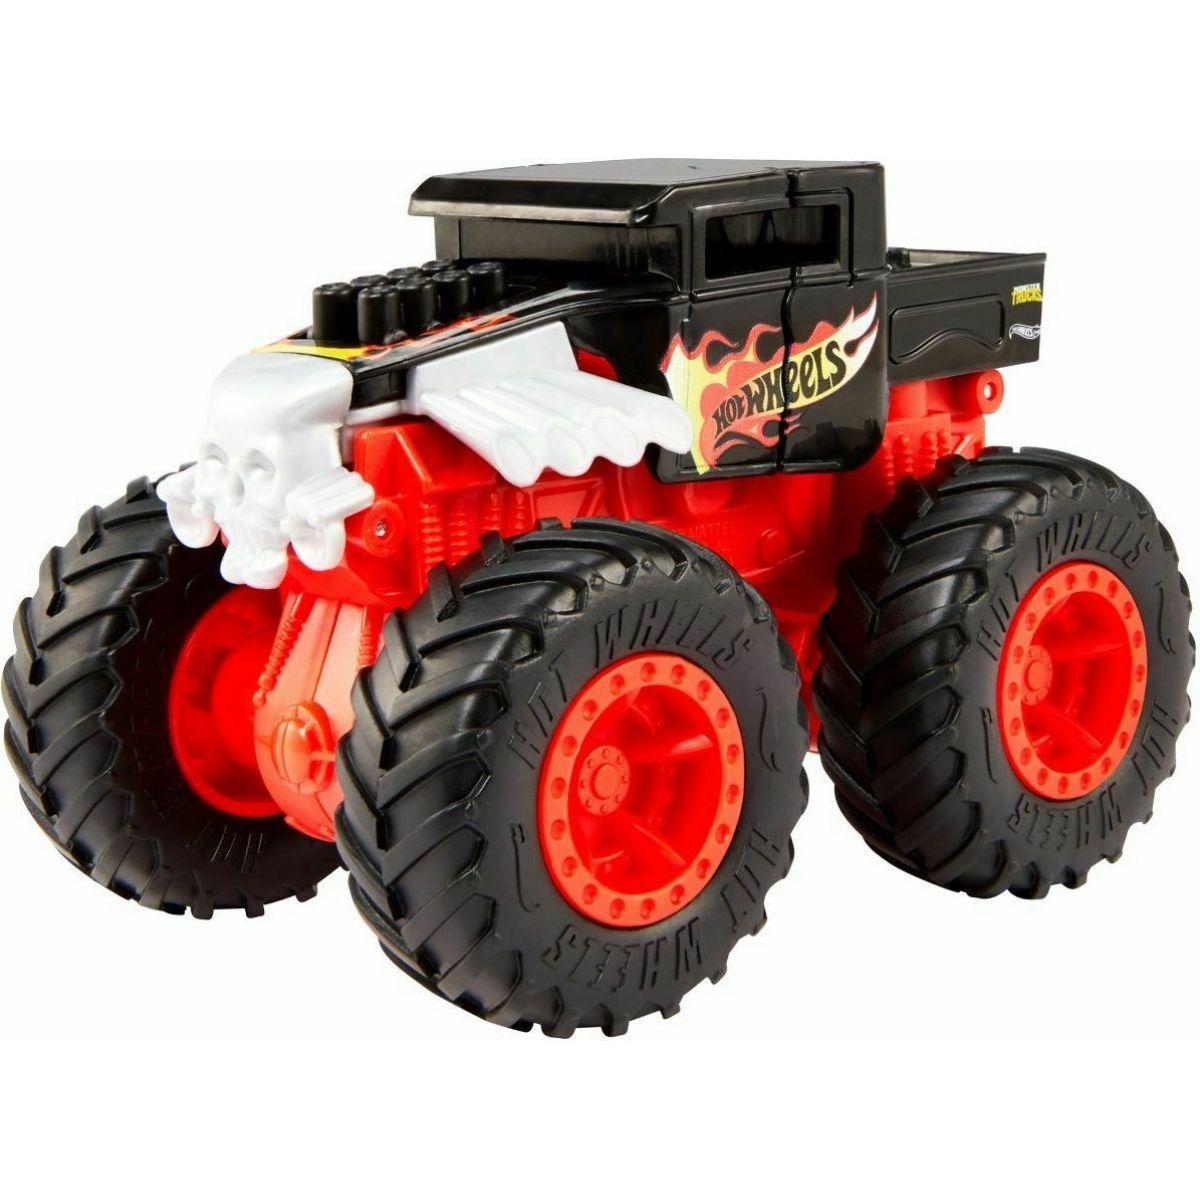 Mattel Hot Wheels monštier trucks veľká zrážka Bone Shaker